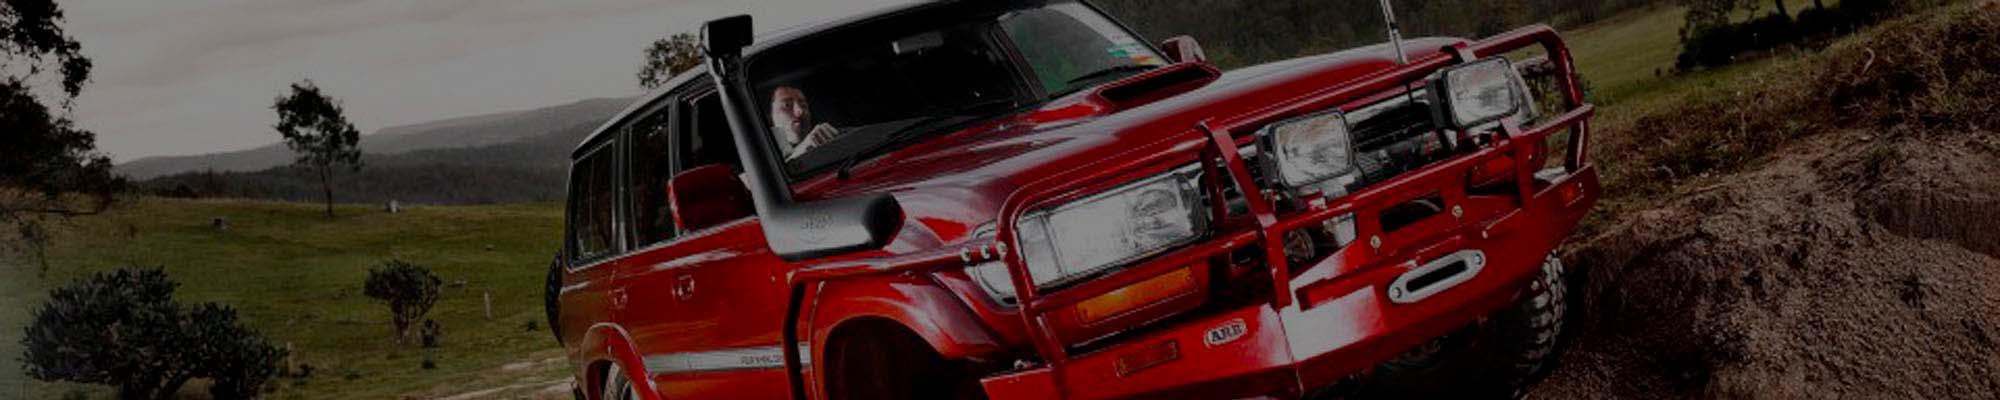 Manual to Auto Conversion - Header